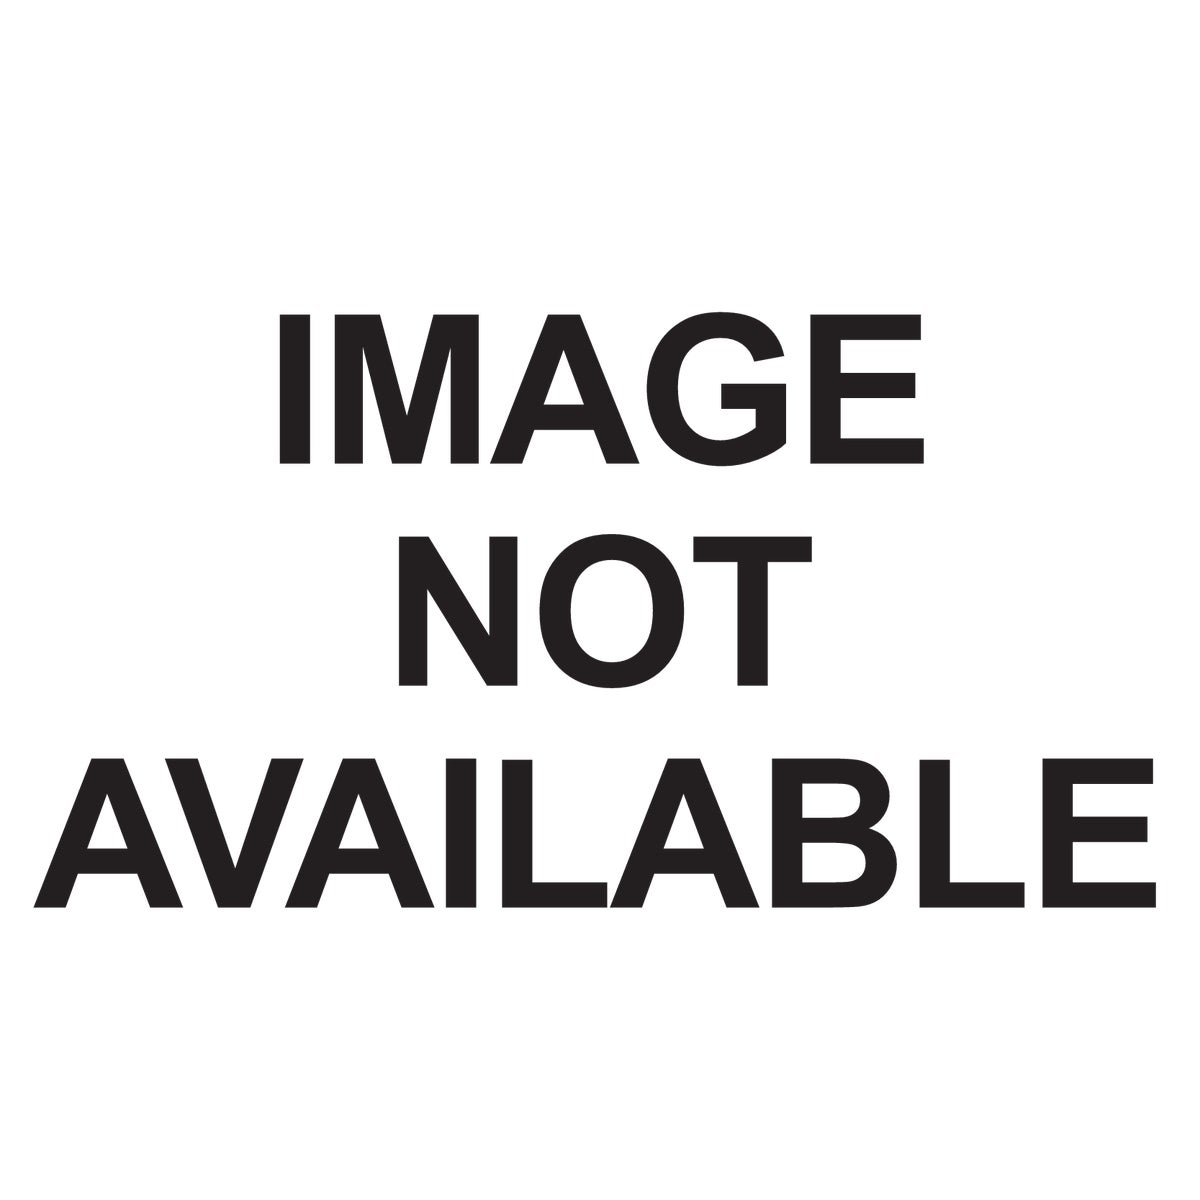 BLACK PNEUMATIC CLOSER - V170BL by National Mfg Co